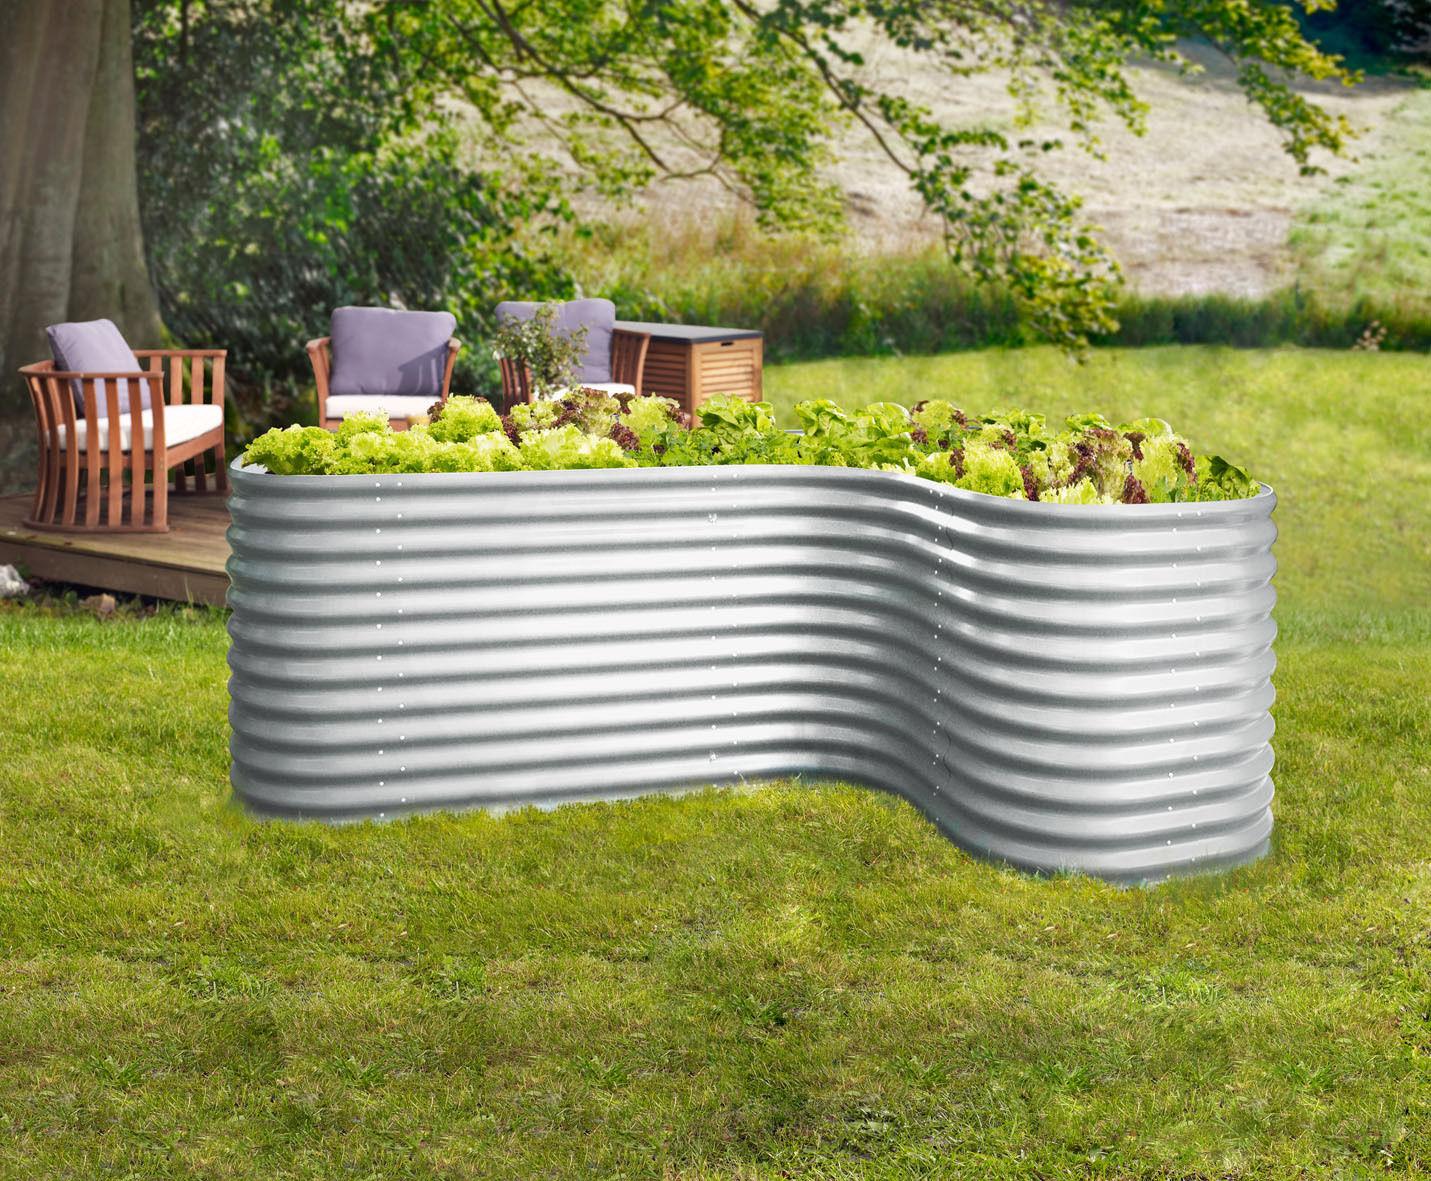 set vitavia hochbeet zinkalum basic erweiterung curve b242xt162xh86 cm alu balkon garten shop. Black Bedroom Furniture Sets. Home Design Ideas